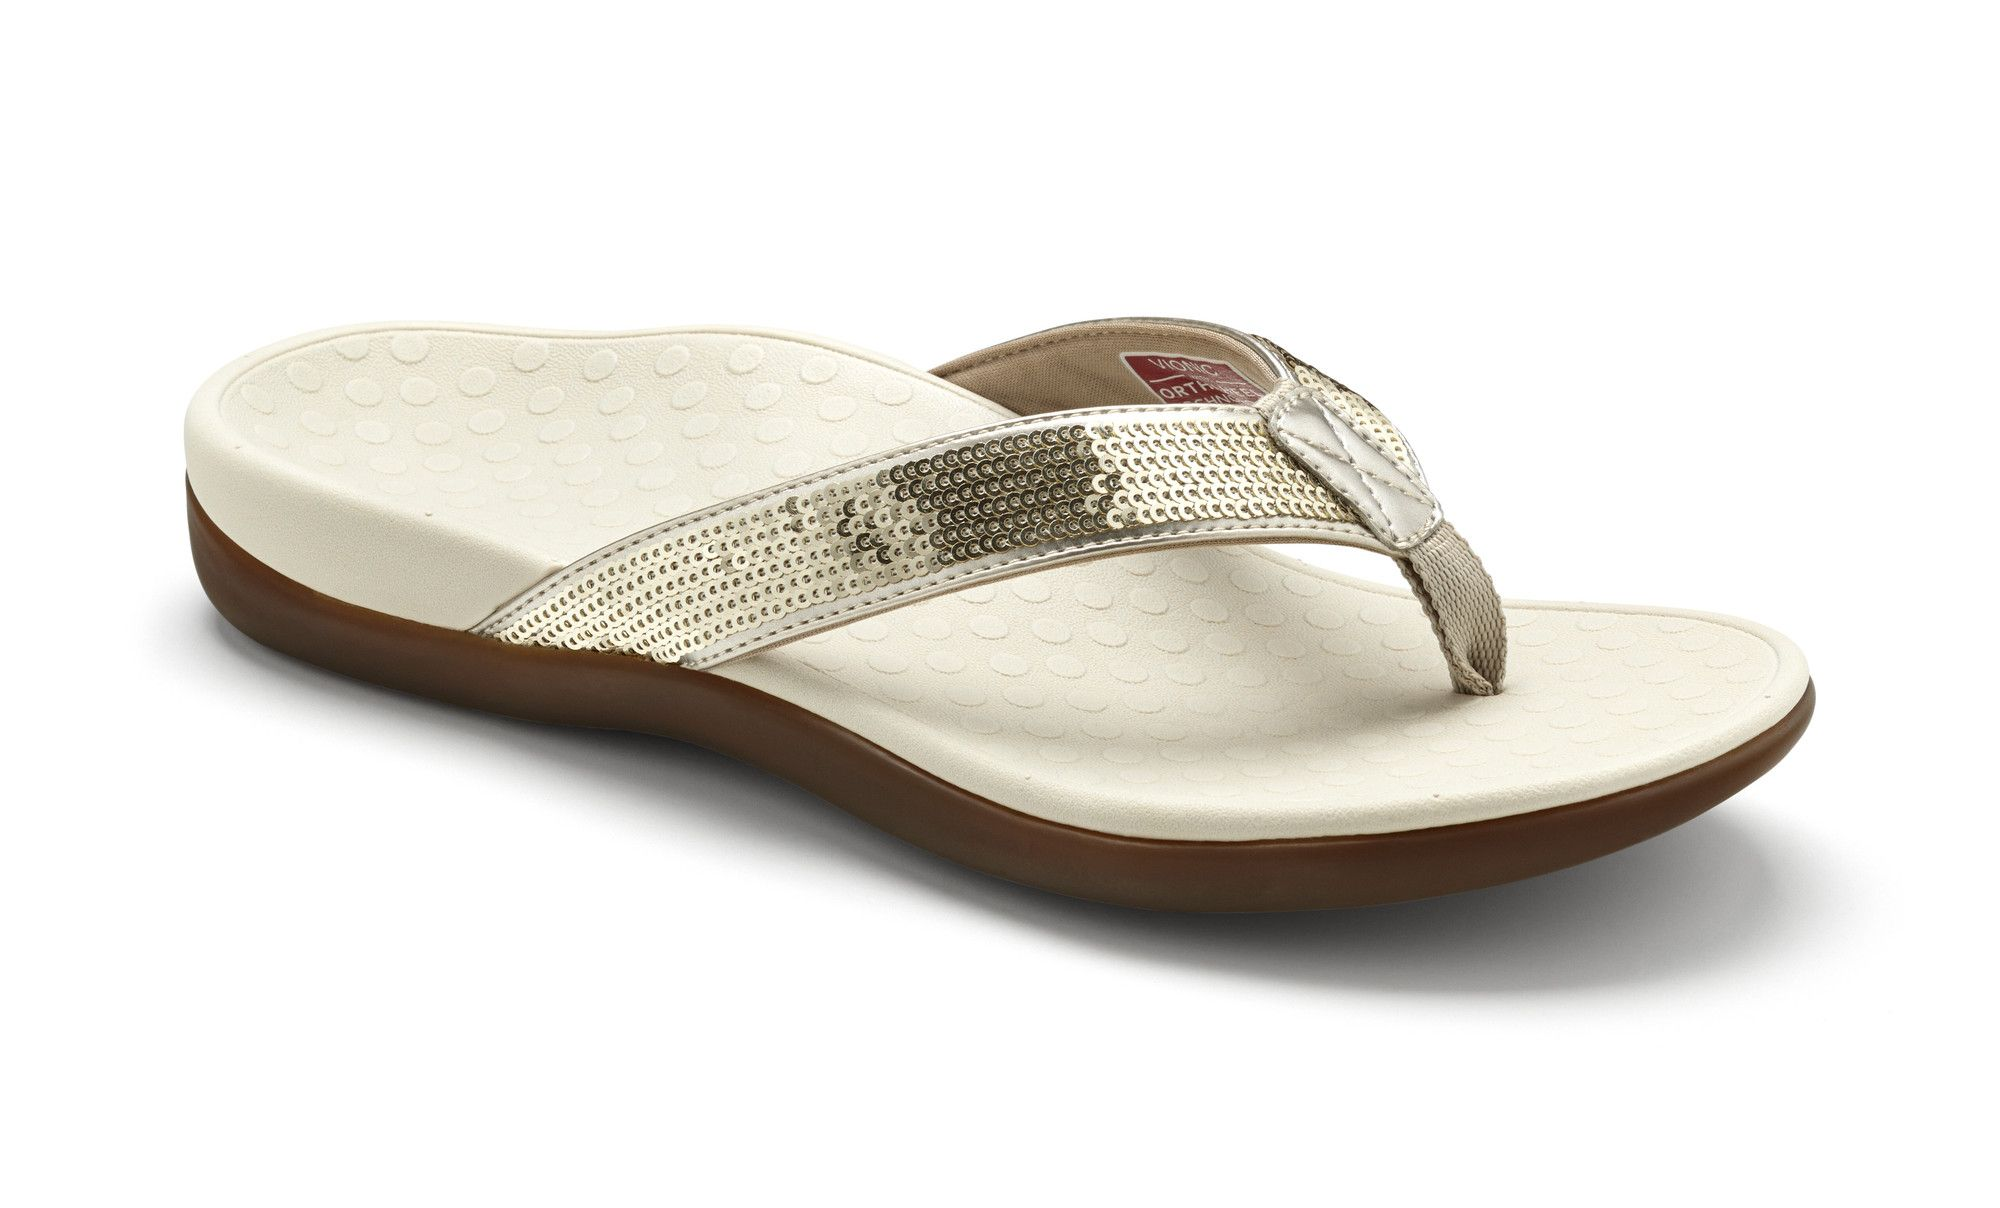 The Vionic Tide sandals